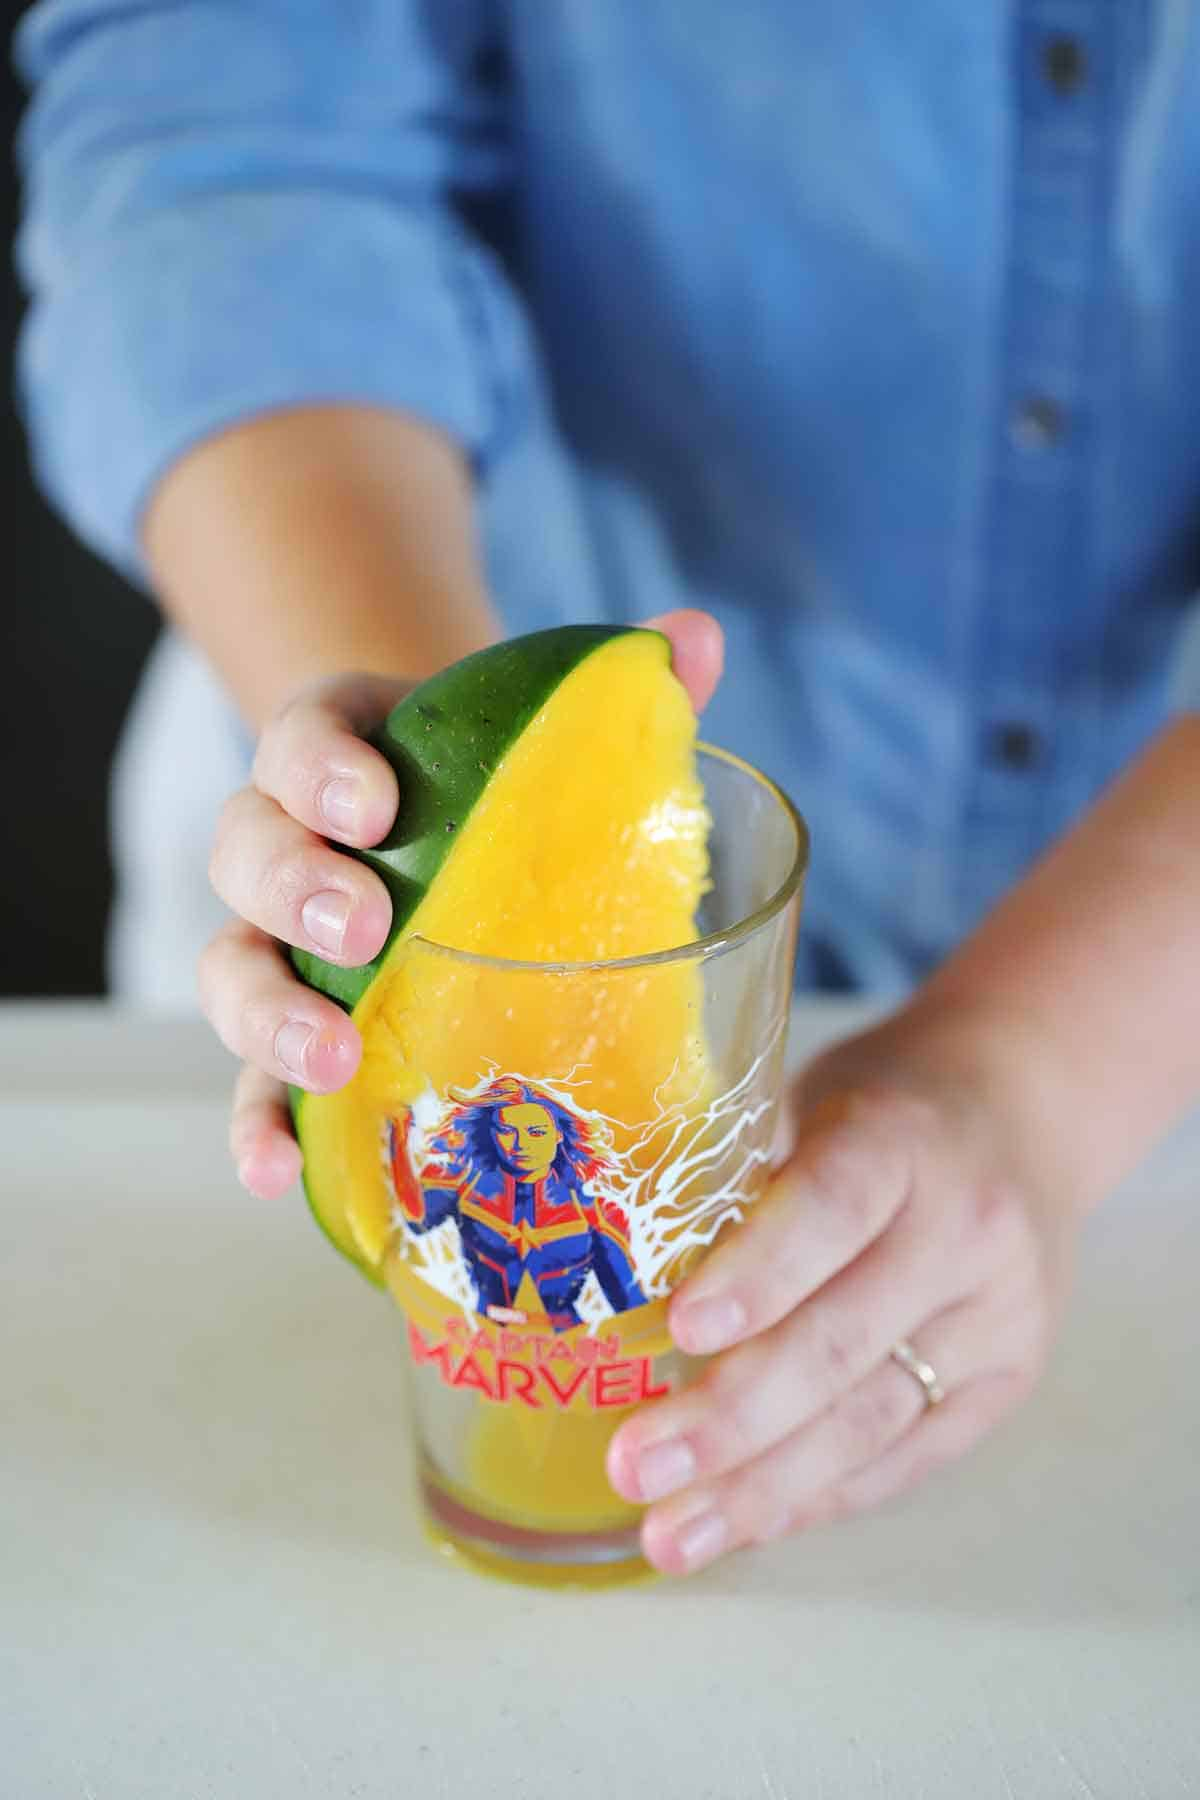 Using a pint glass to peel a mango.